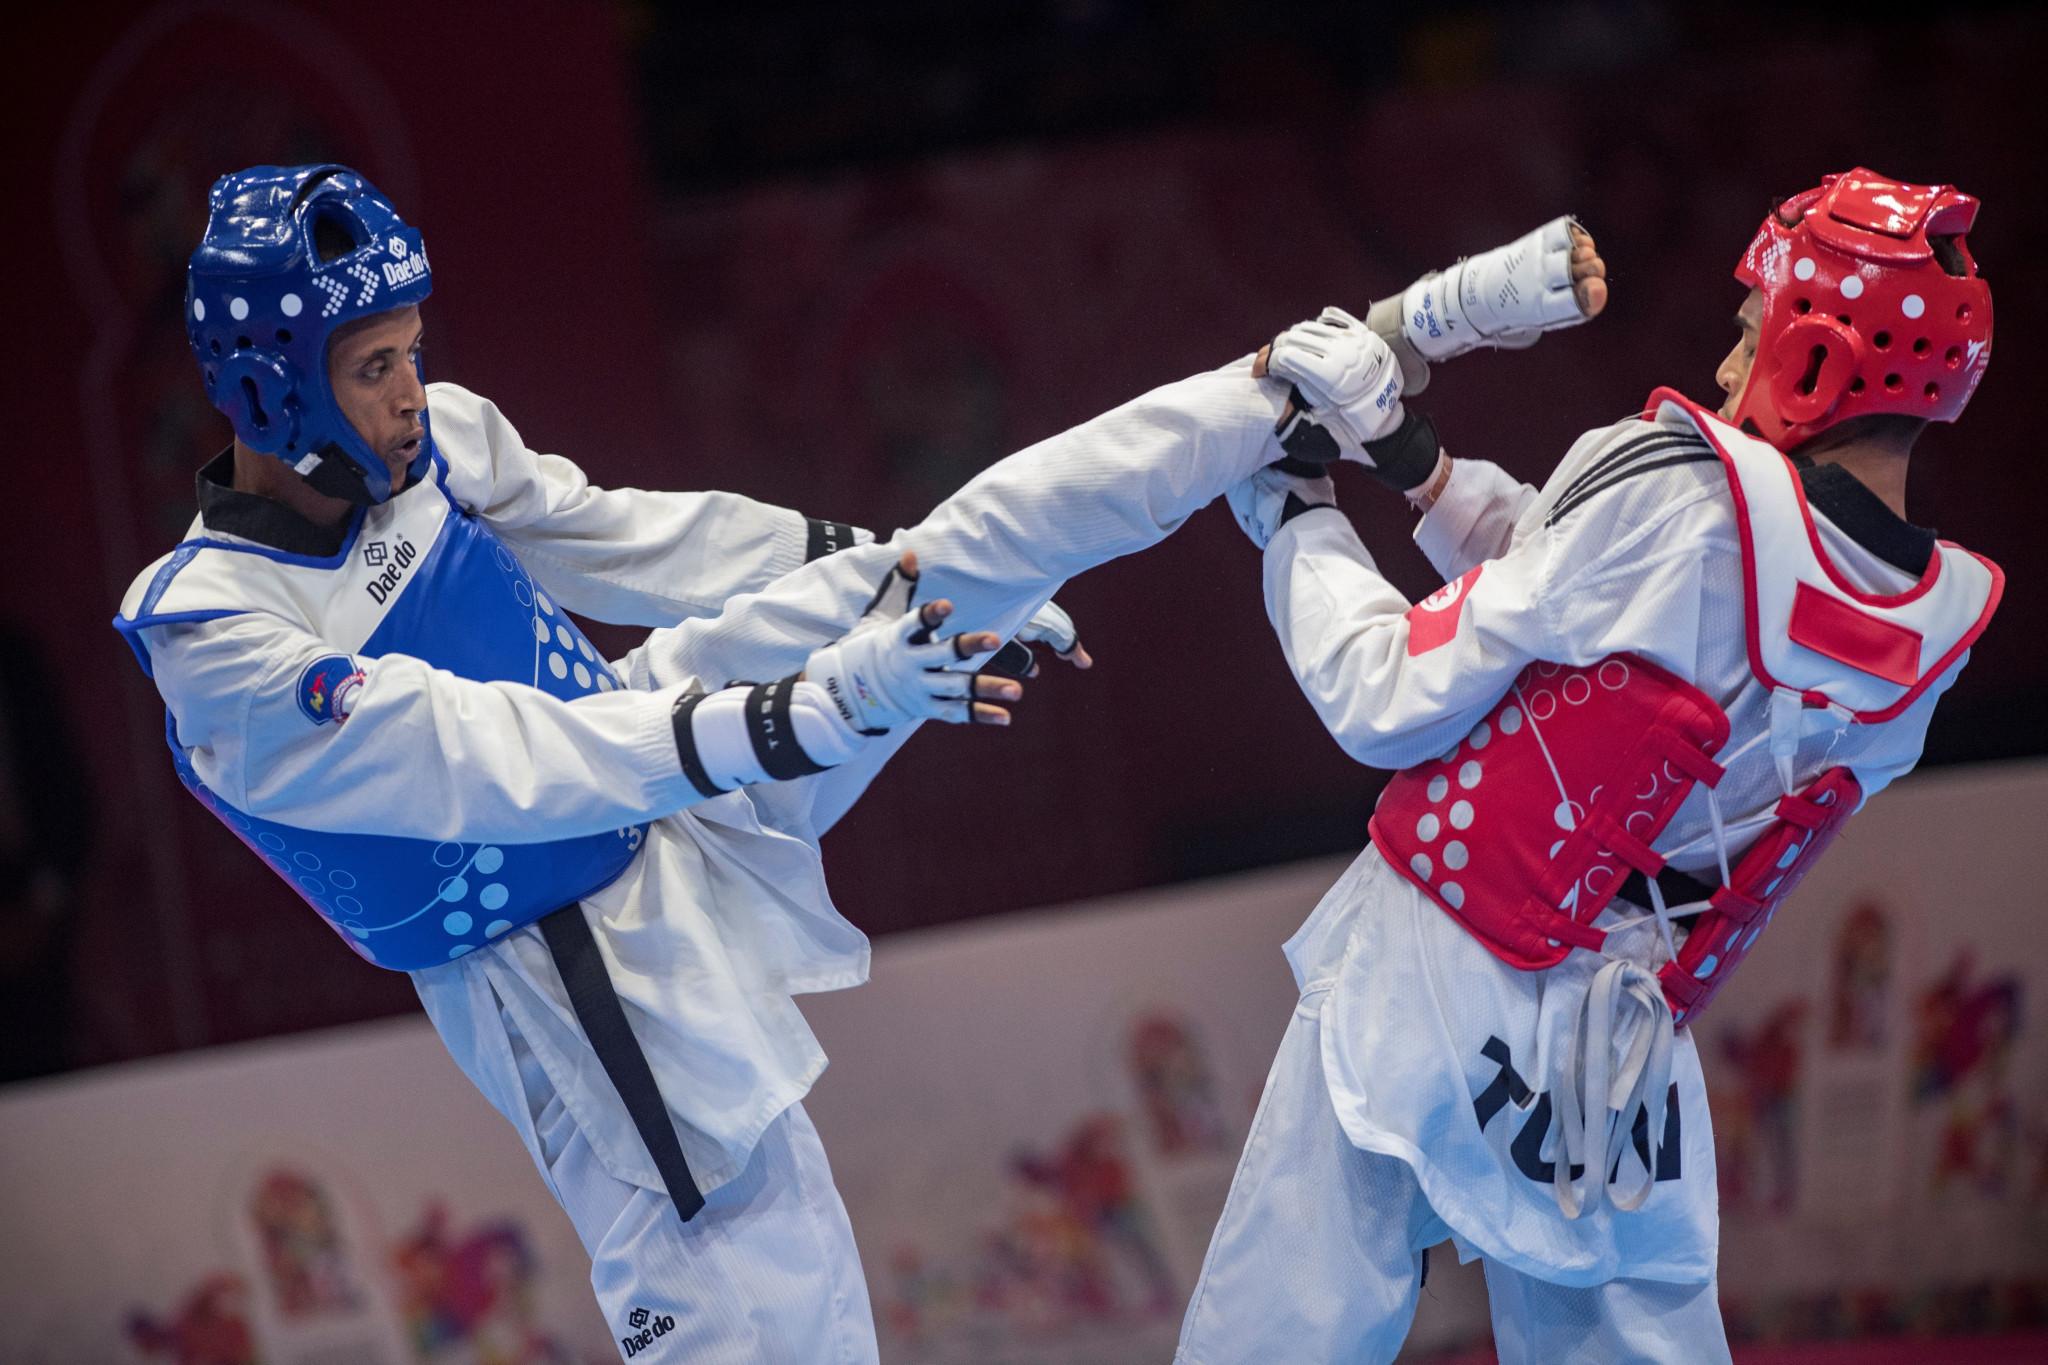 Dakar hosting African Taekwondo Championships for first time since 2001